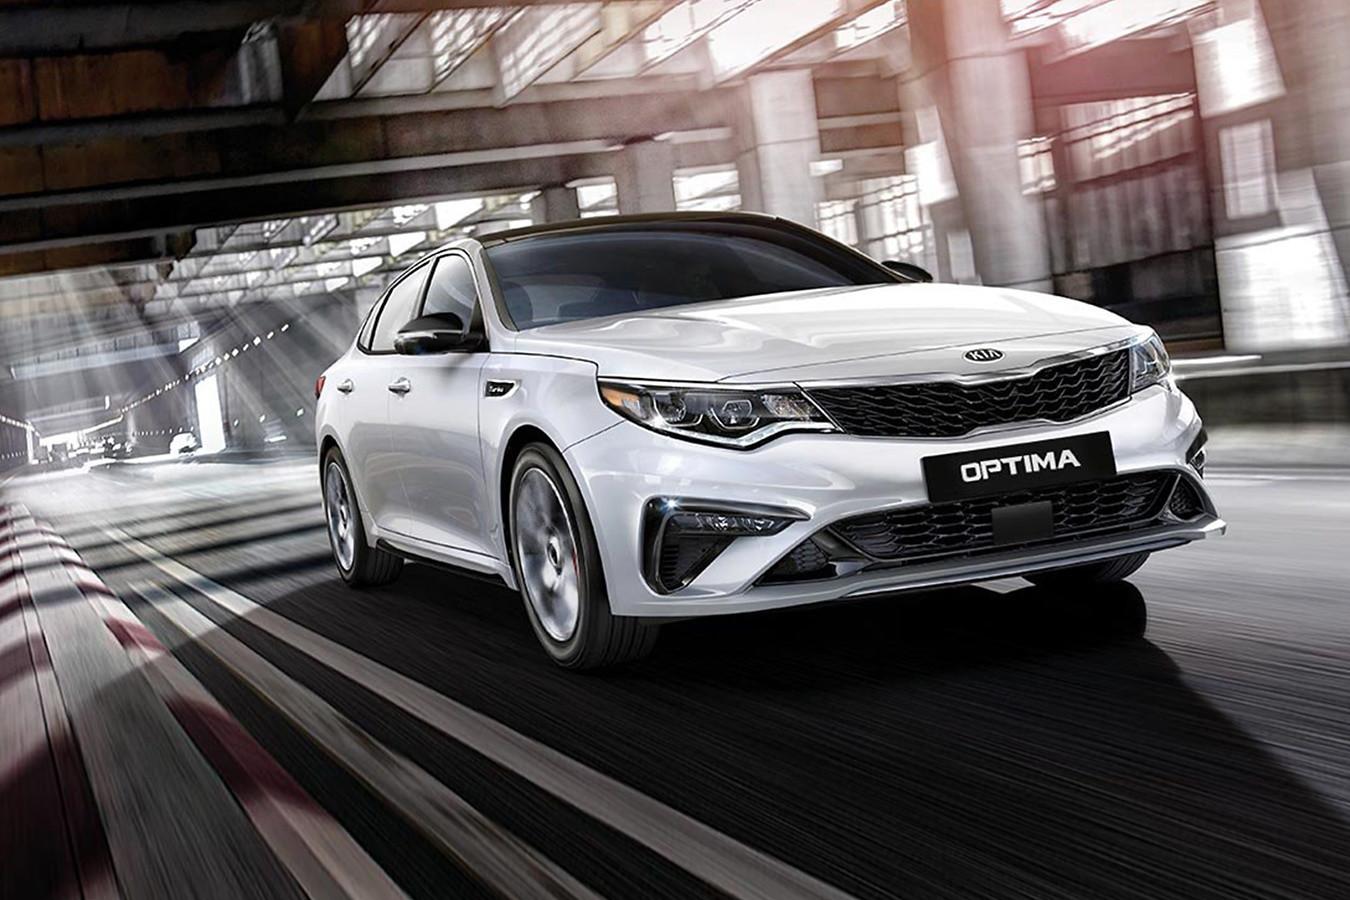 2020 Kia Optima for Sale in Oklahoma City, OK